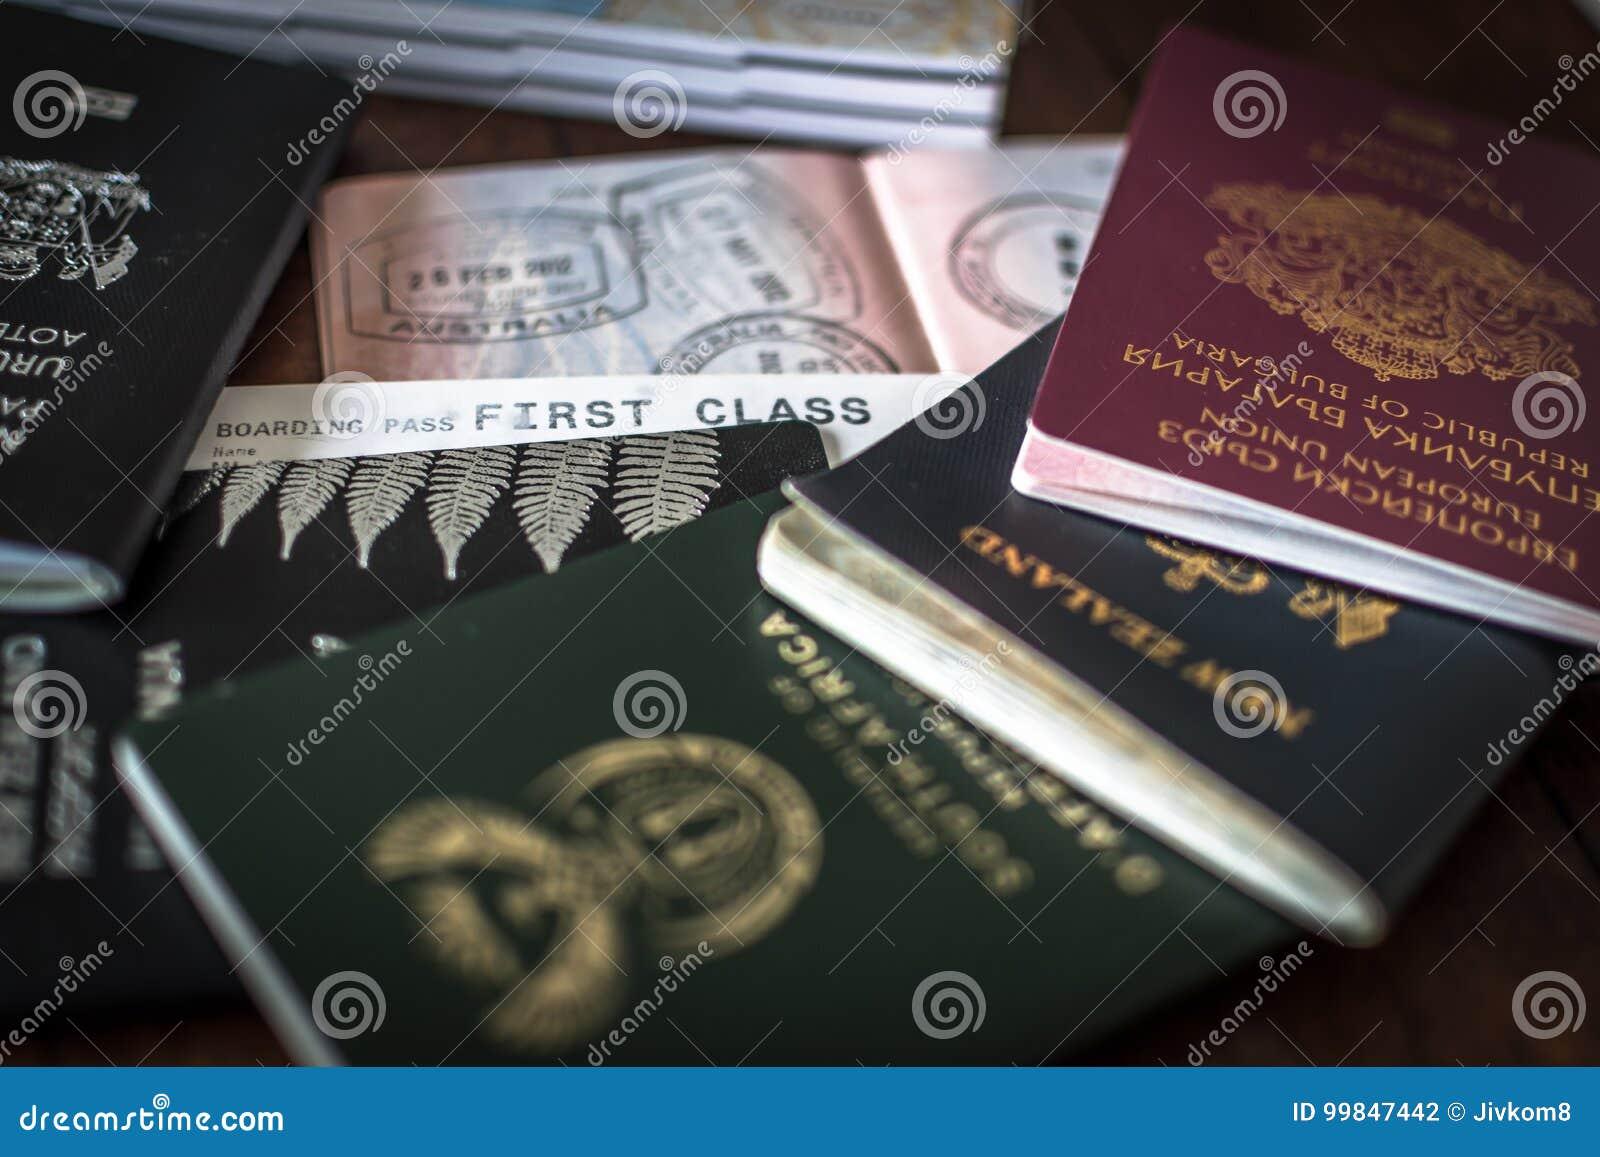 Passeports et visa